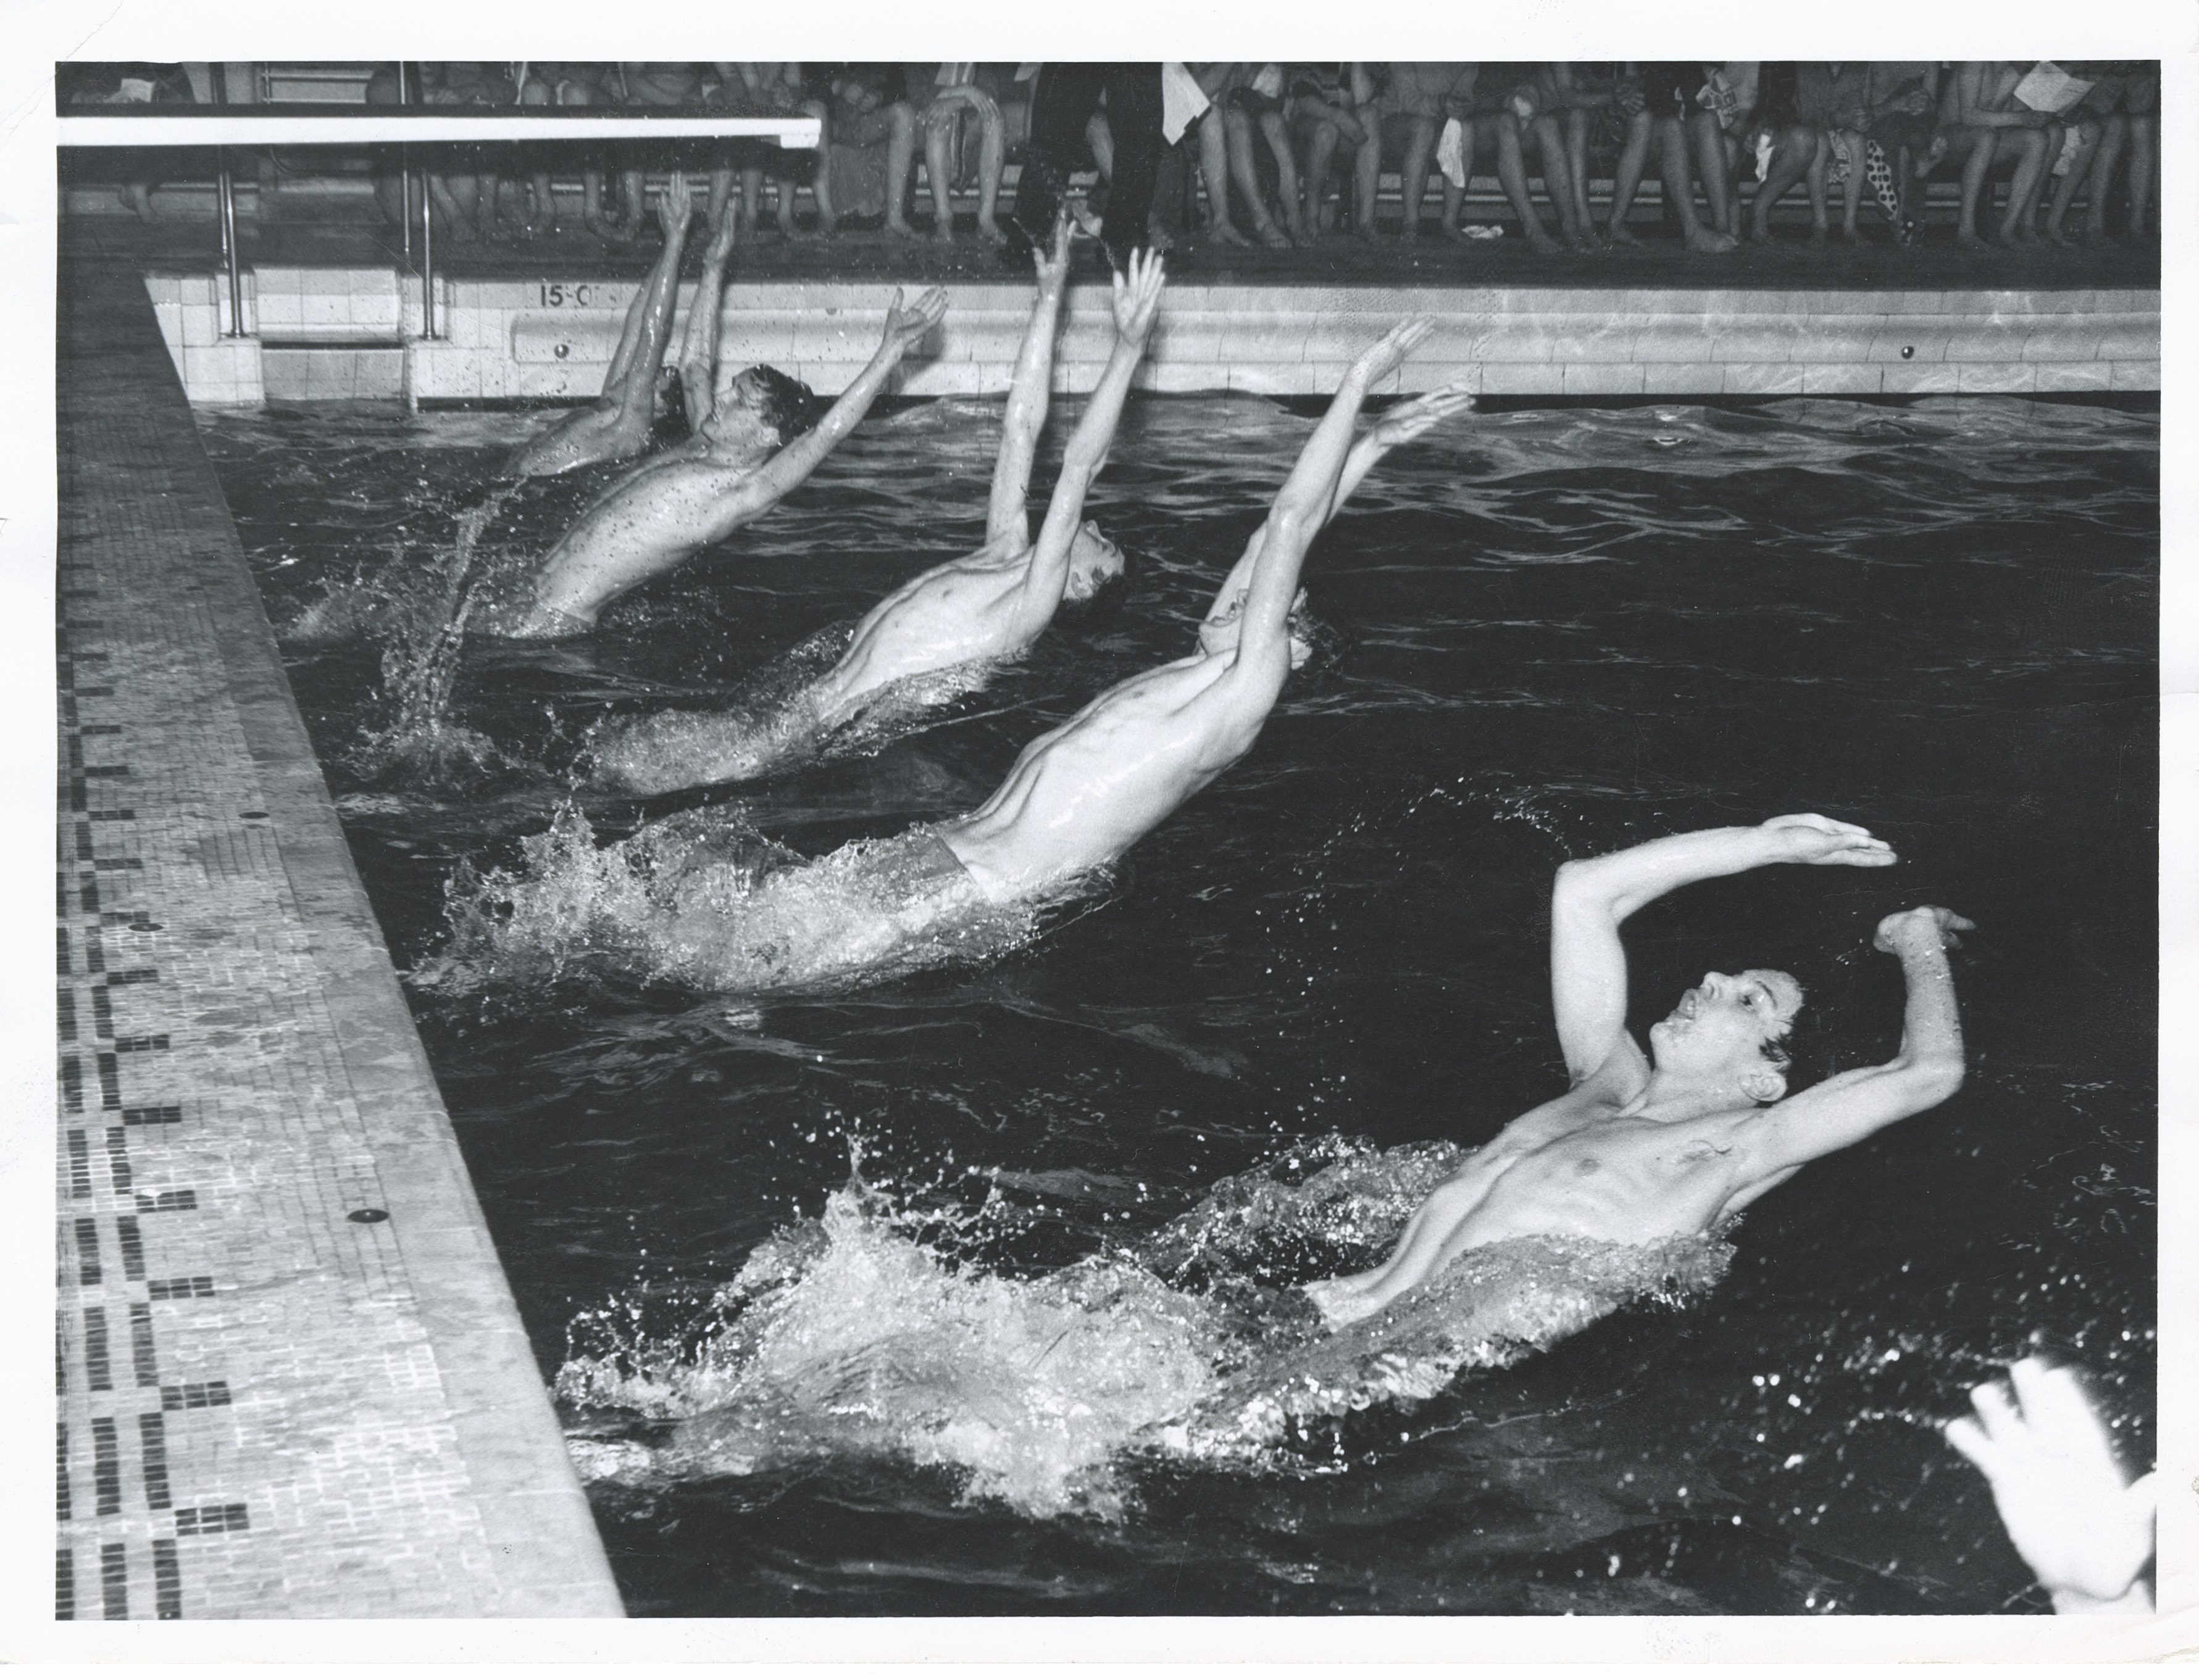 Robert Gordon's College Annual swimming gala held in the Bon-Accord Baths